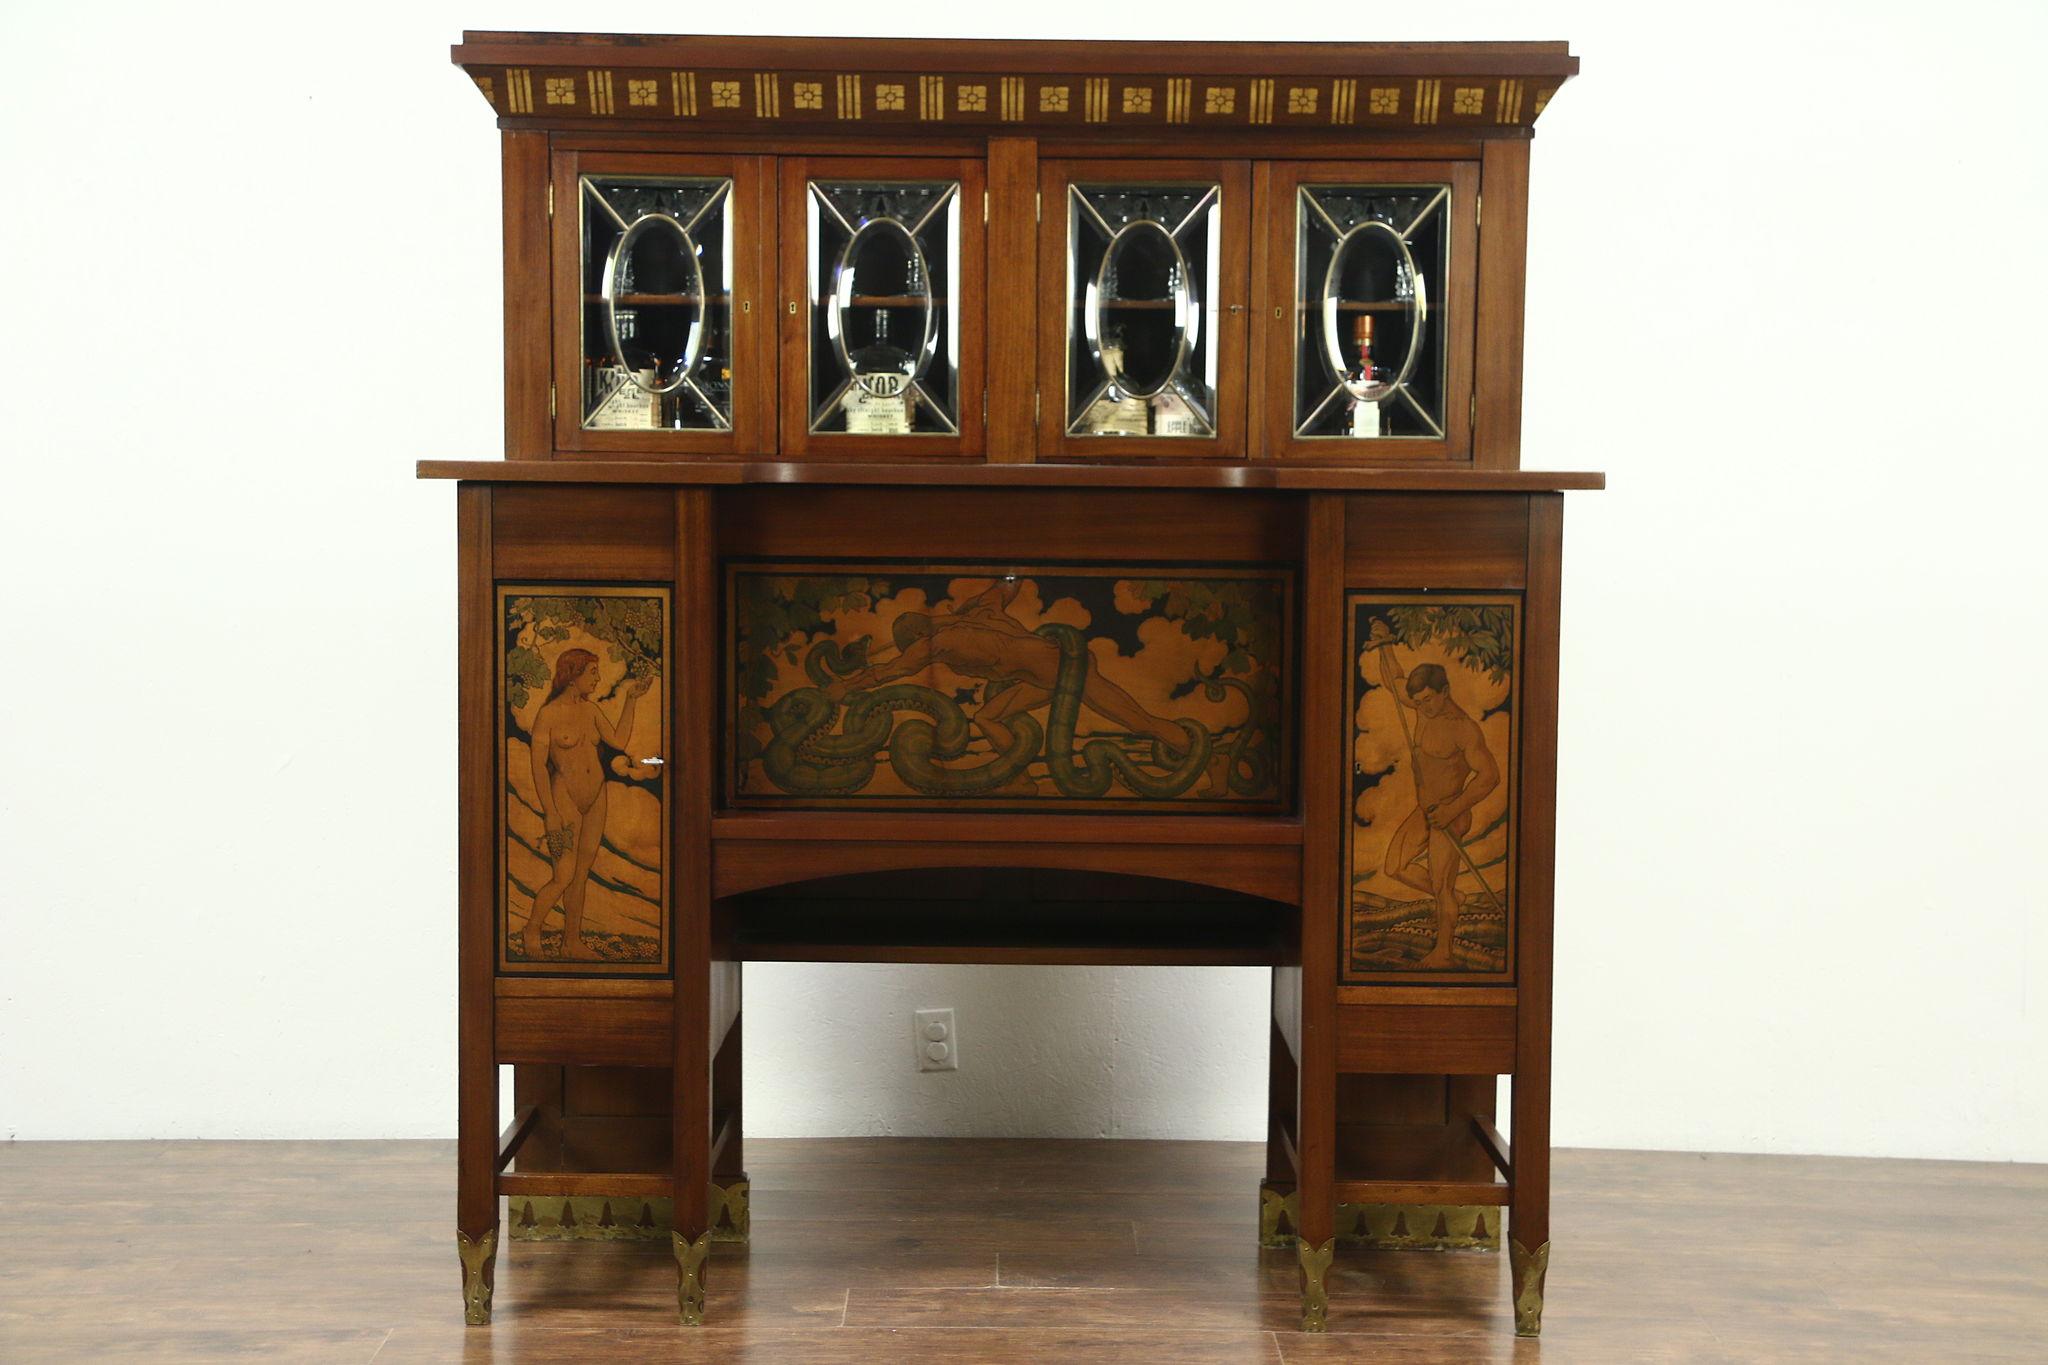 philadelphia artist art mixed craft museum show furniture of adam media crowell